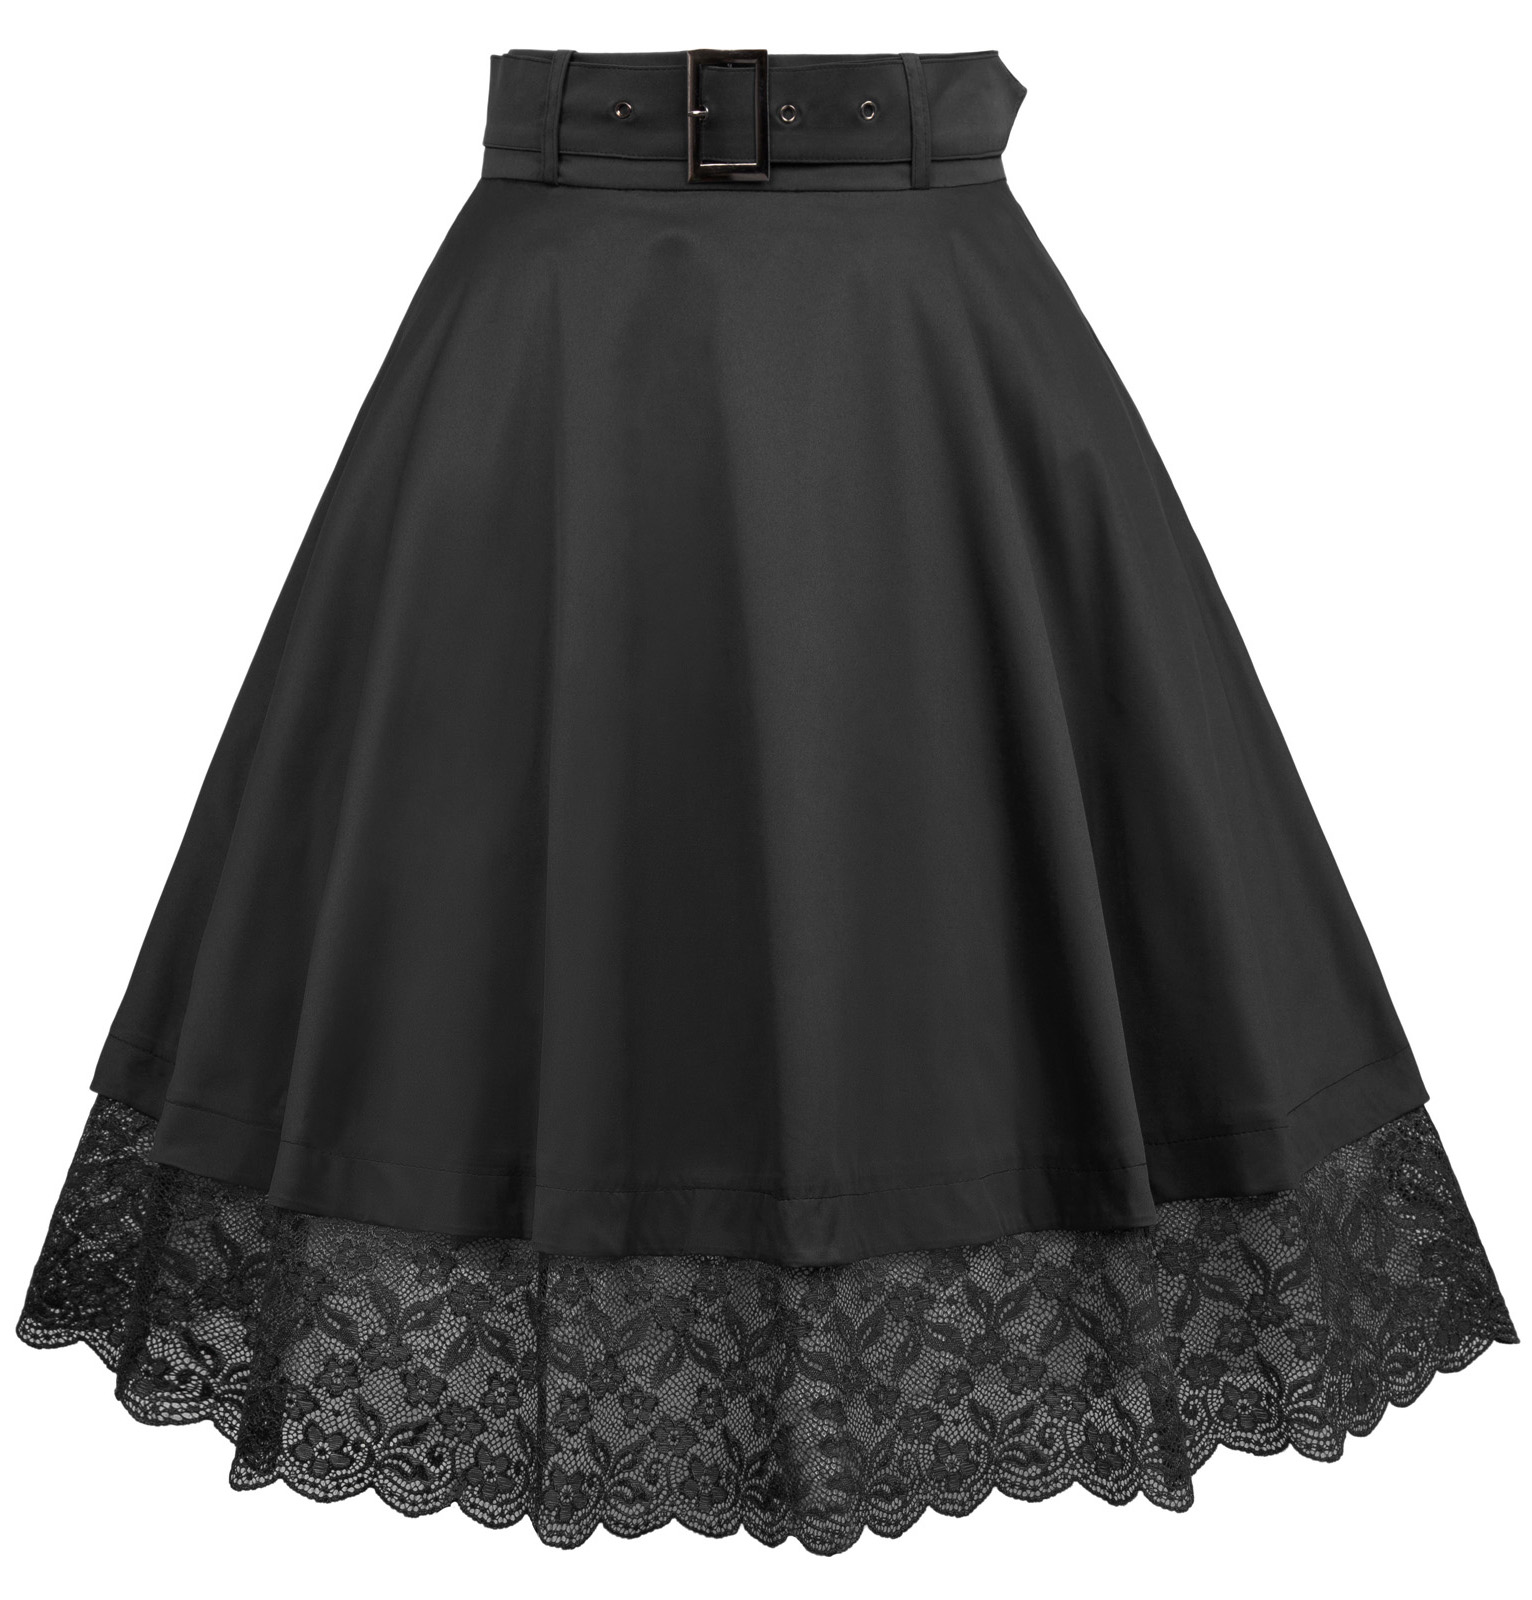 hot 2018 summer skirt women Vintage High Waist Lace Hem Skater Flared A-line Skirts Swing skirt With Belt